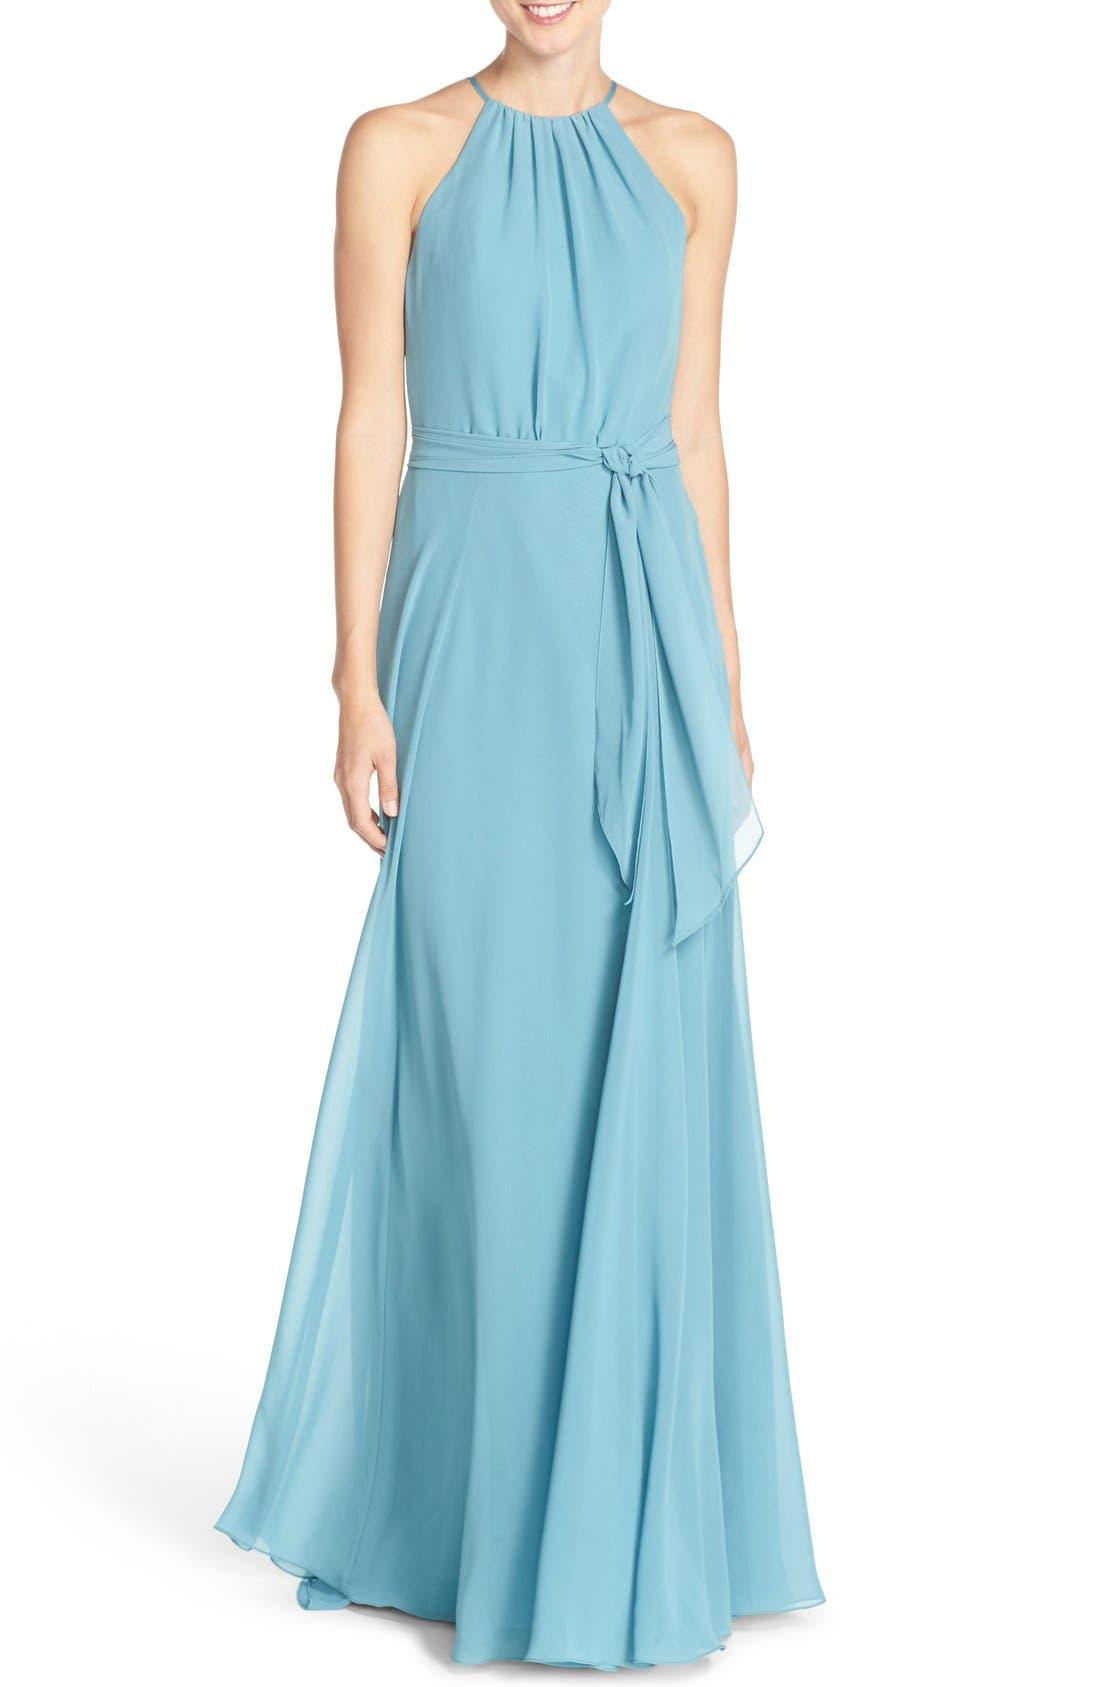 'Delaney' Belted A-Line Chiffon Halter Dress,                             Main thumbnail 2, color,